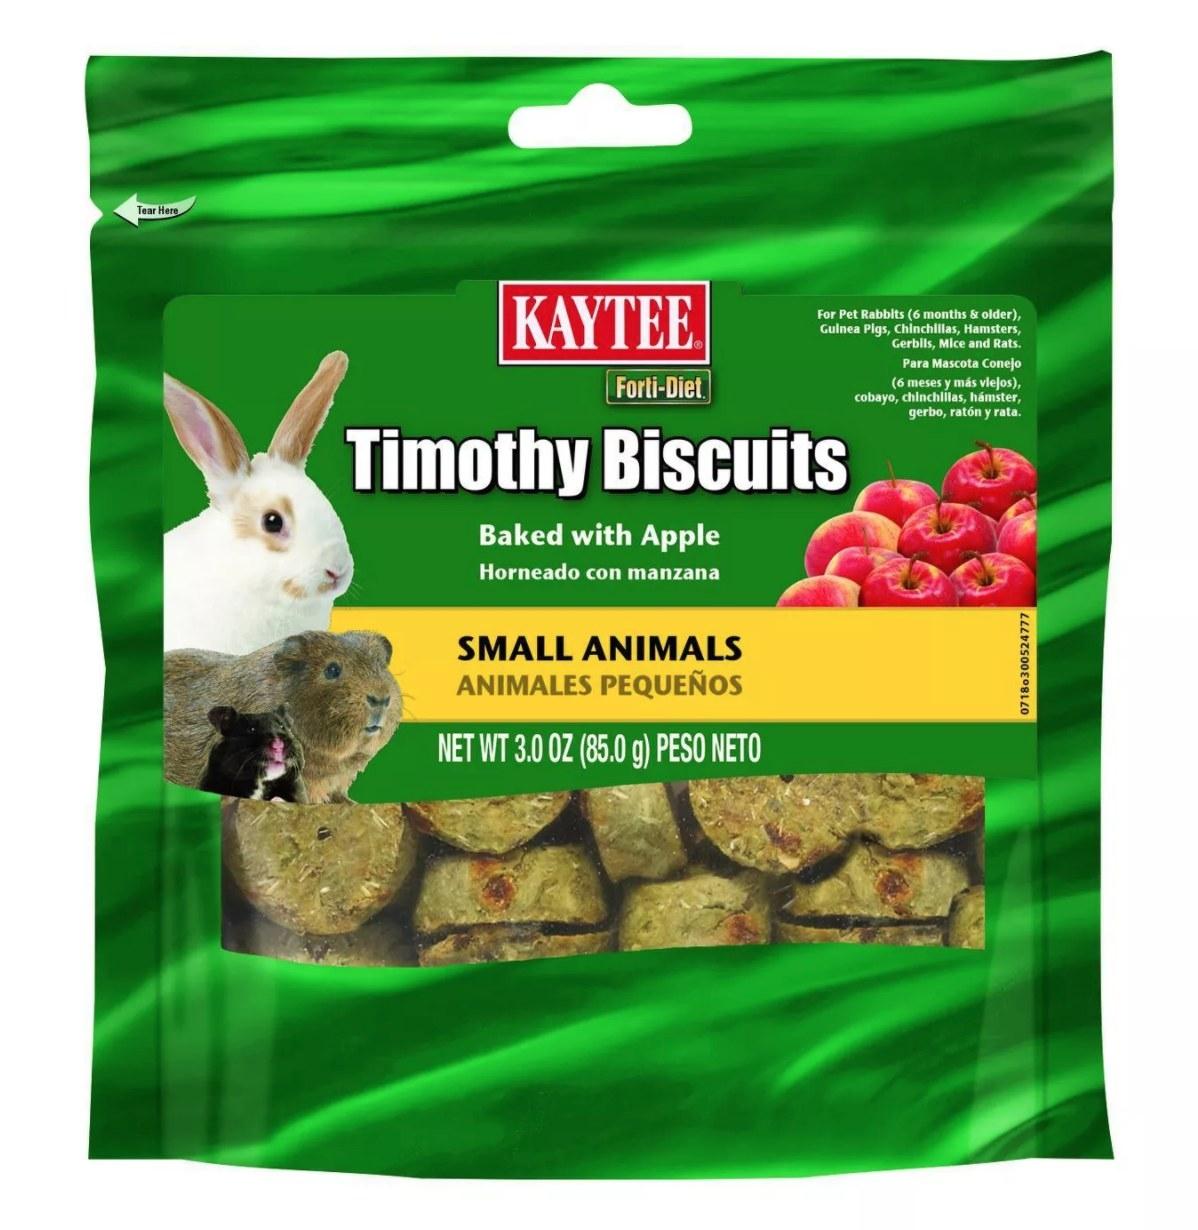 A bag of the baked apple bunny treats